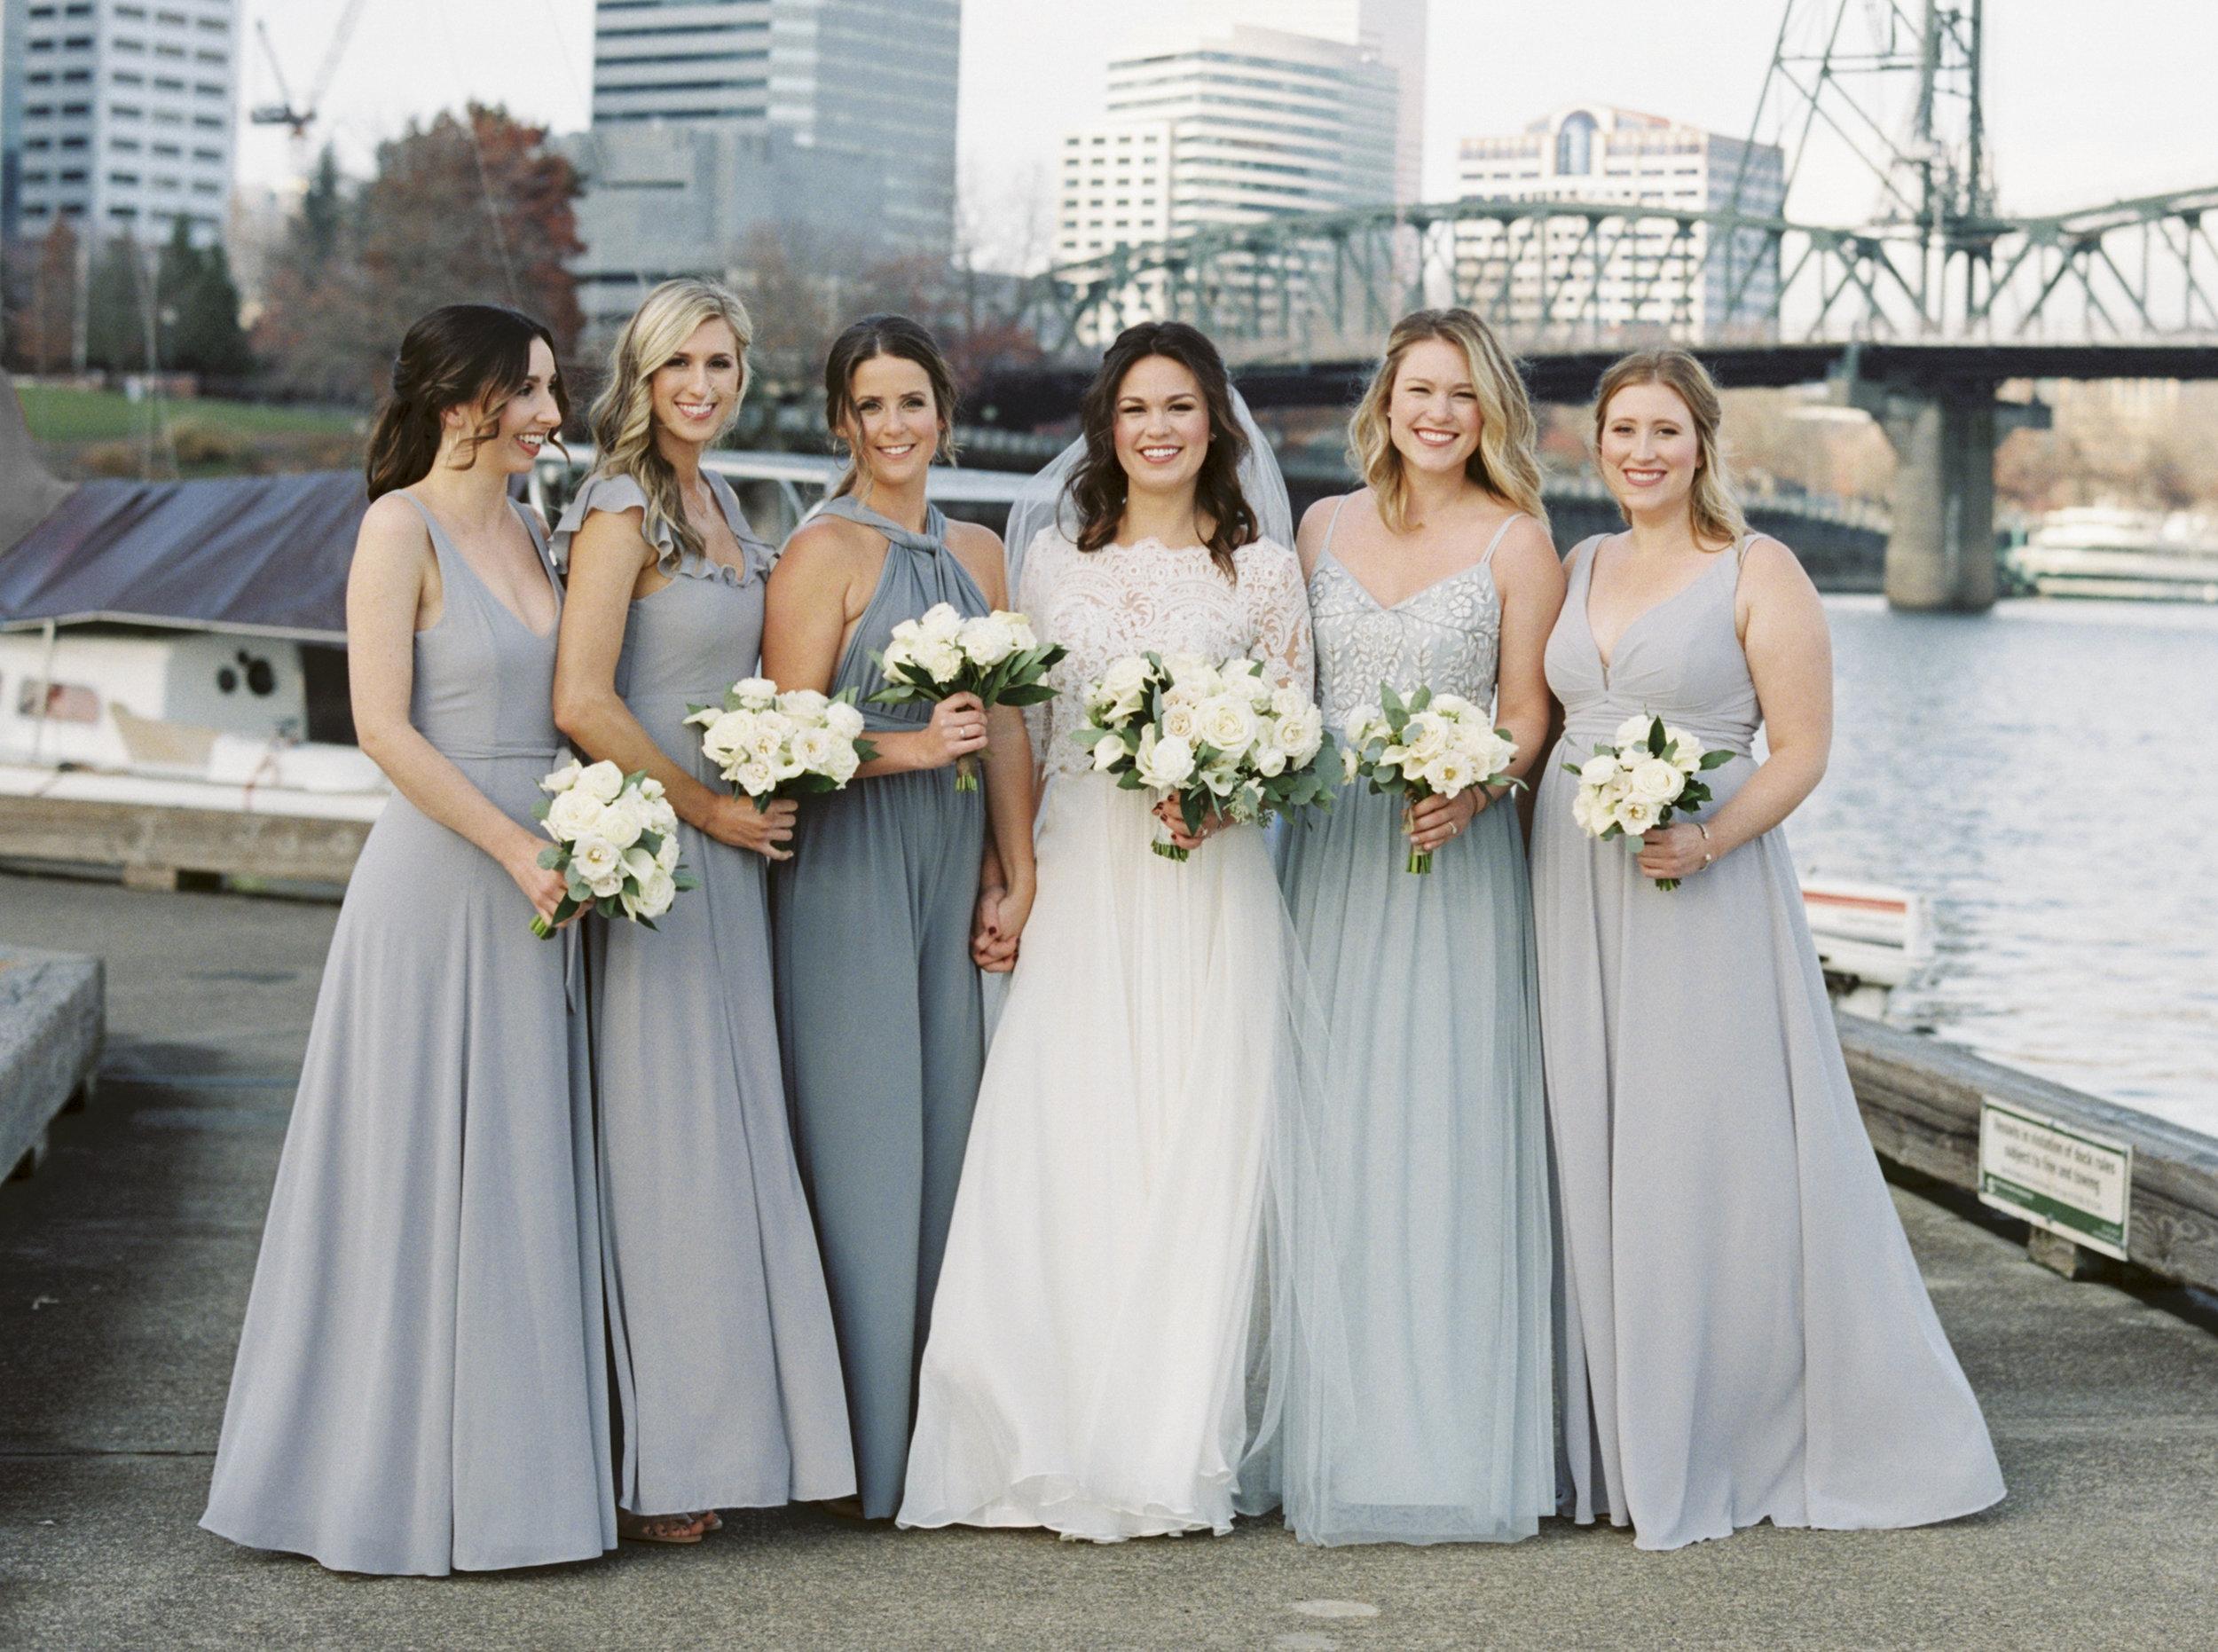 Castaway_Wedding_Photographer_Samantha&Garrett_054.jpg